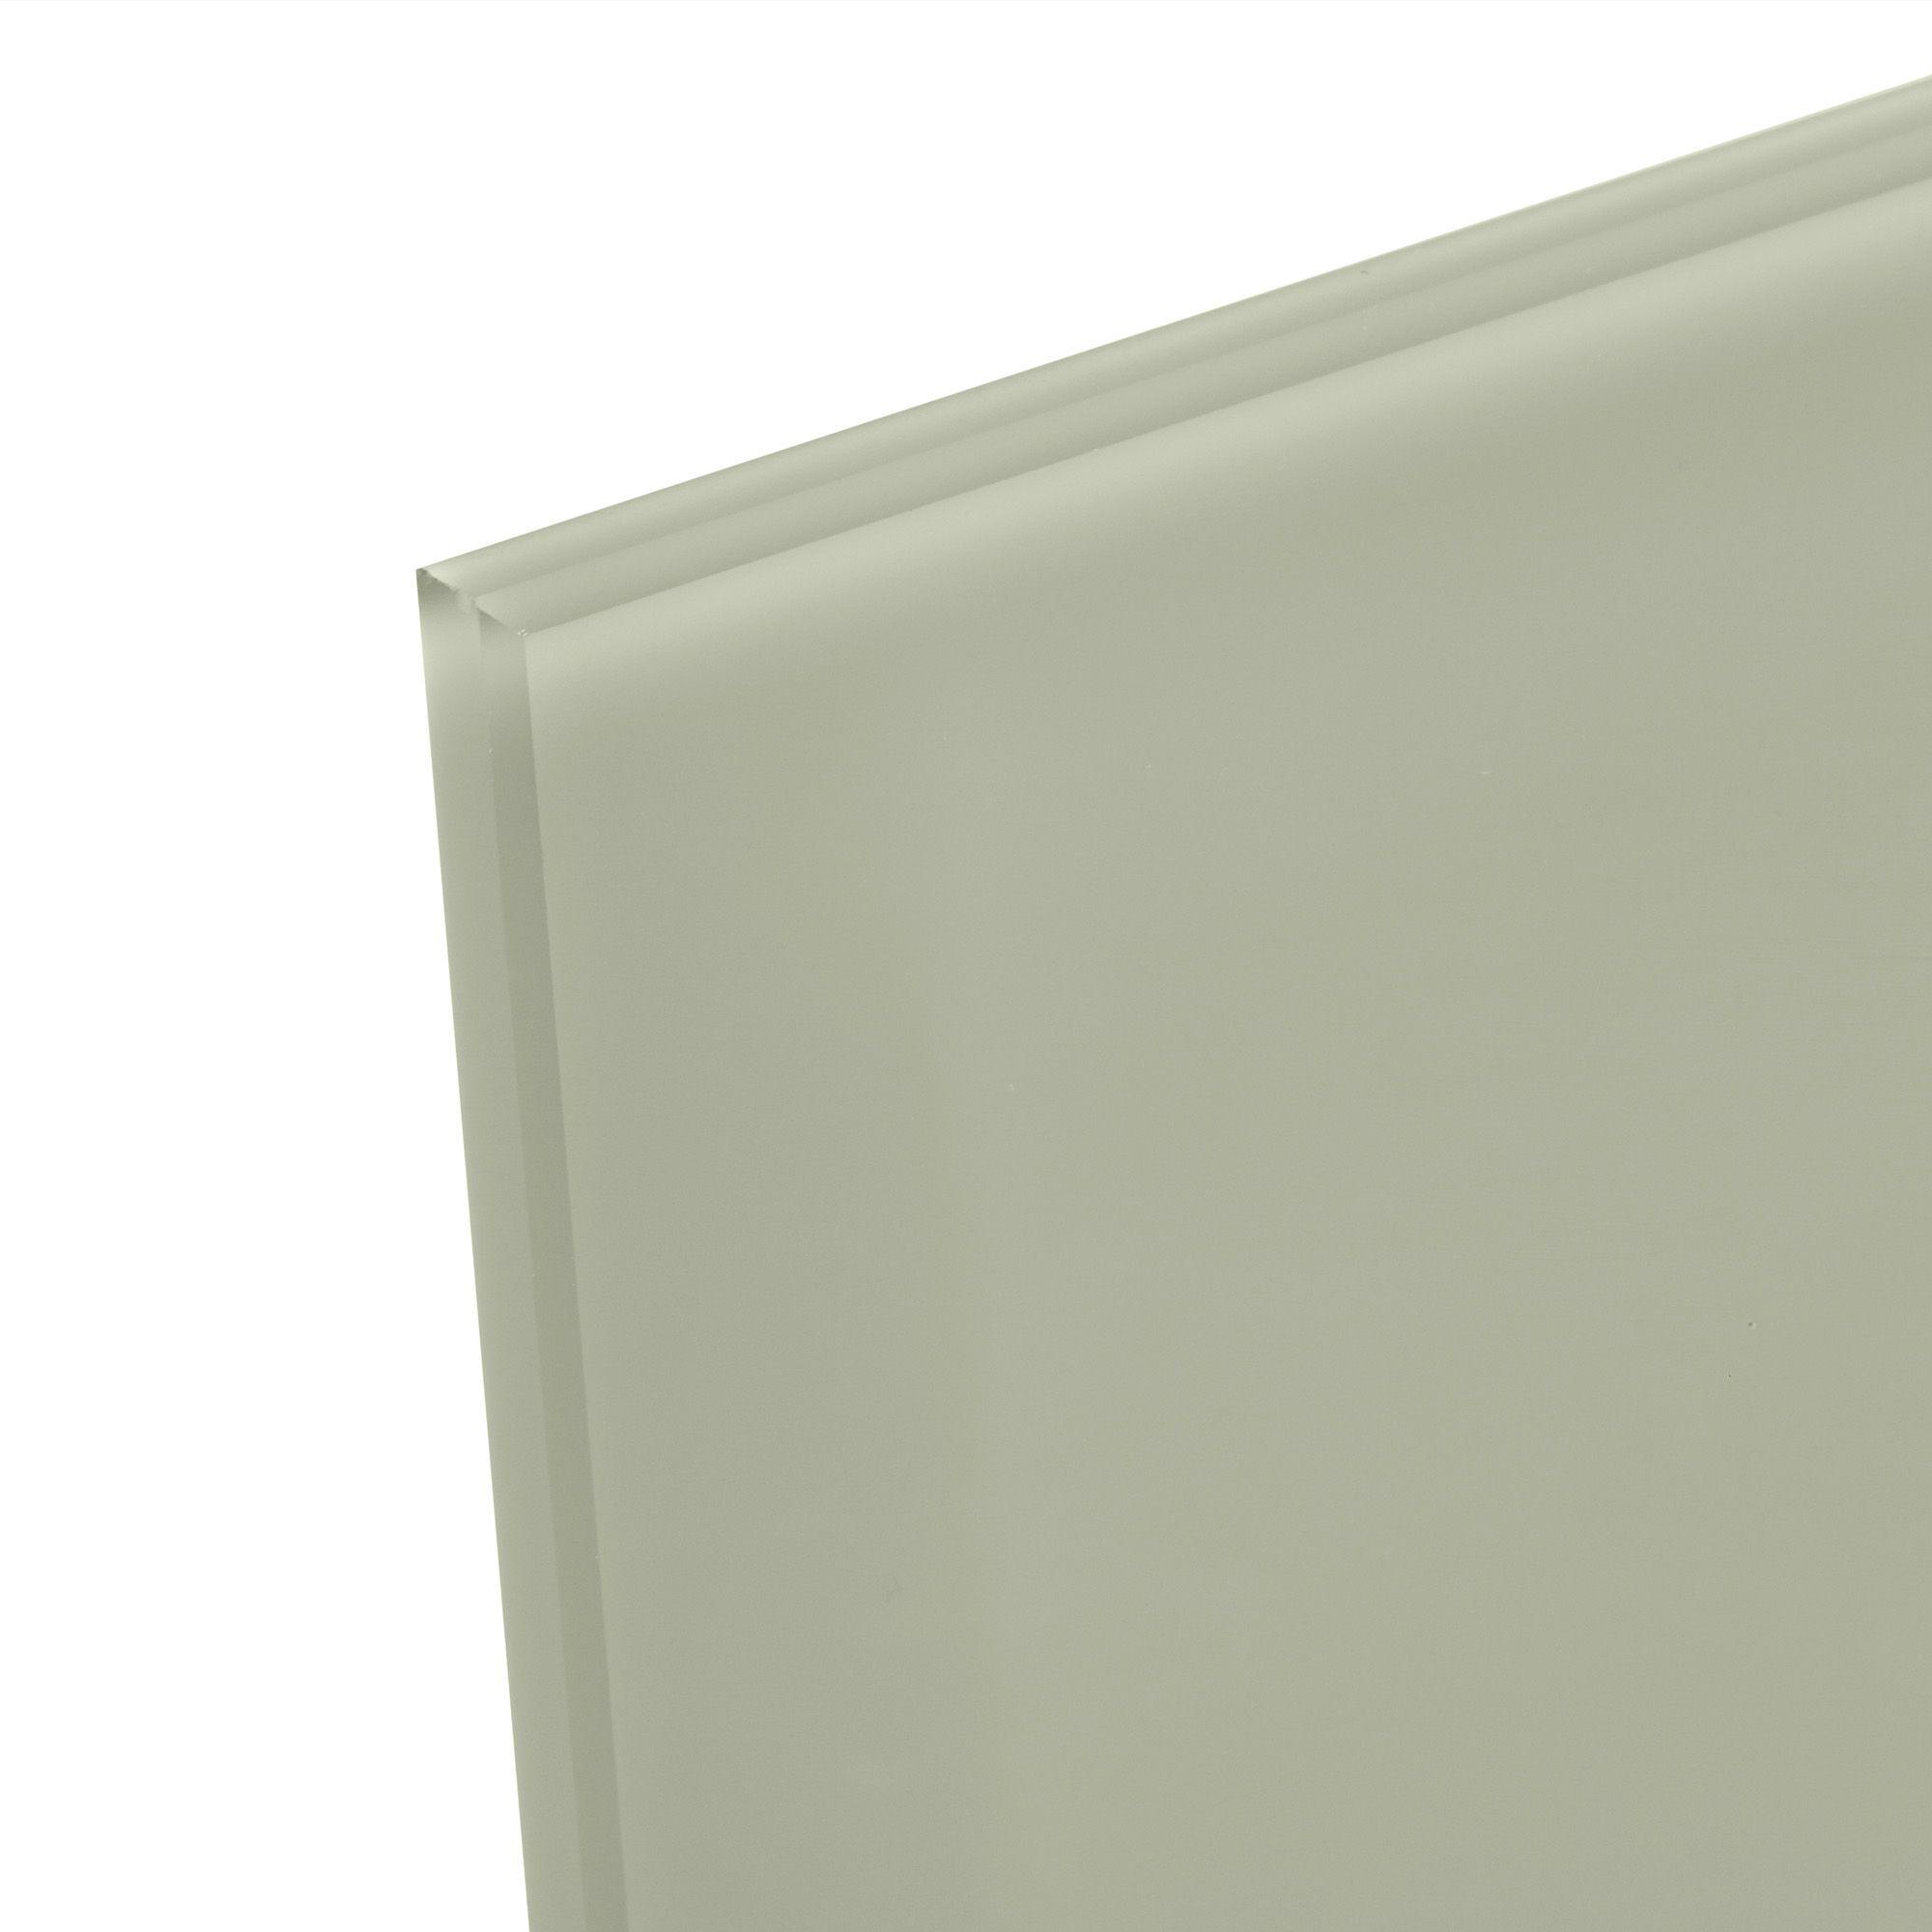 6mm Alep Green & Light Grey Glass Splashback